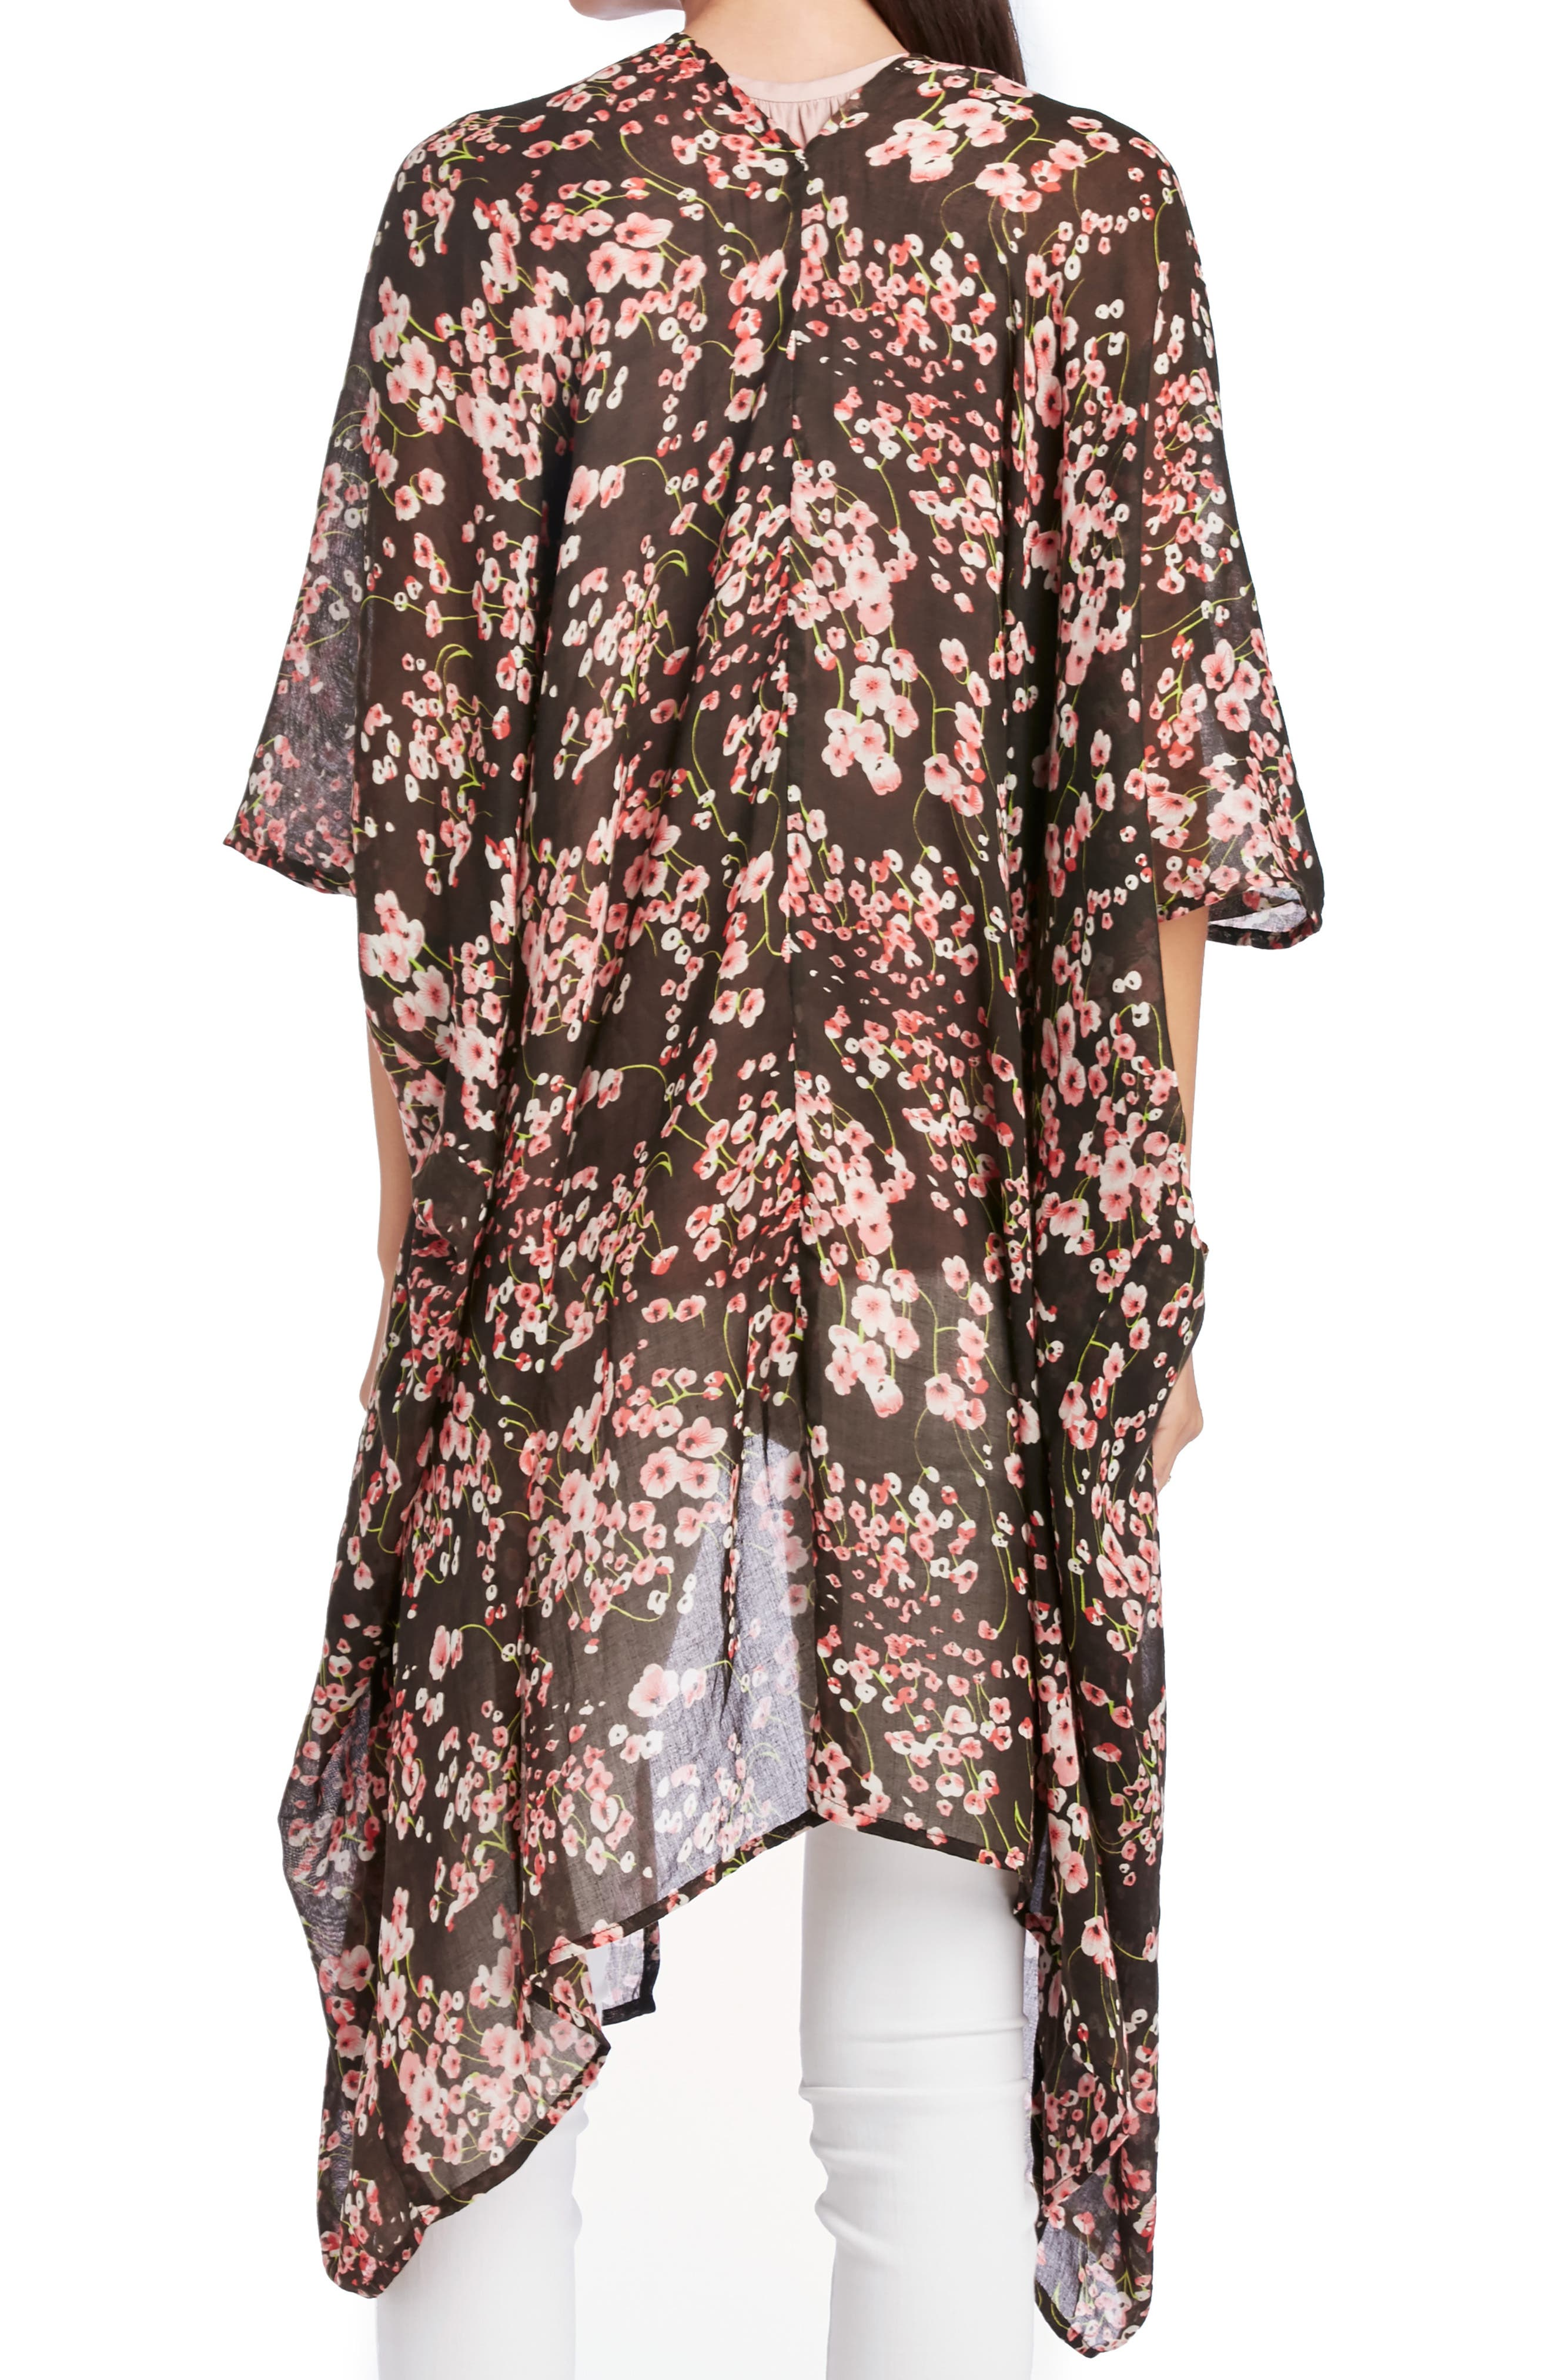 SOLE SOCIETY, Cherry Blossom Kimono, Alternate thumbnail 2, color, 002